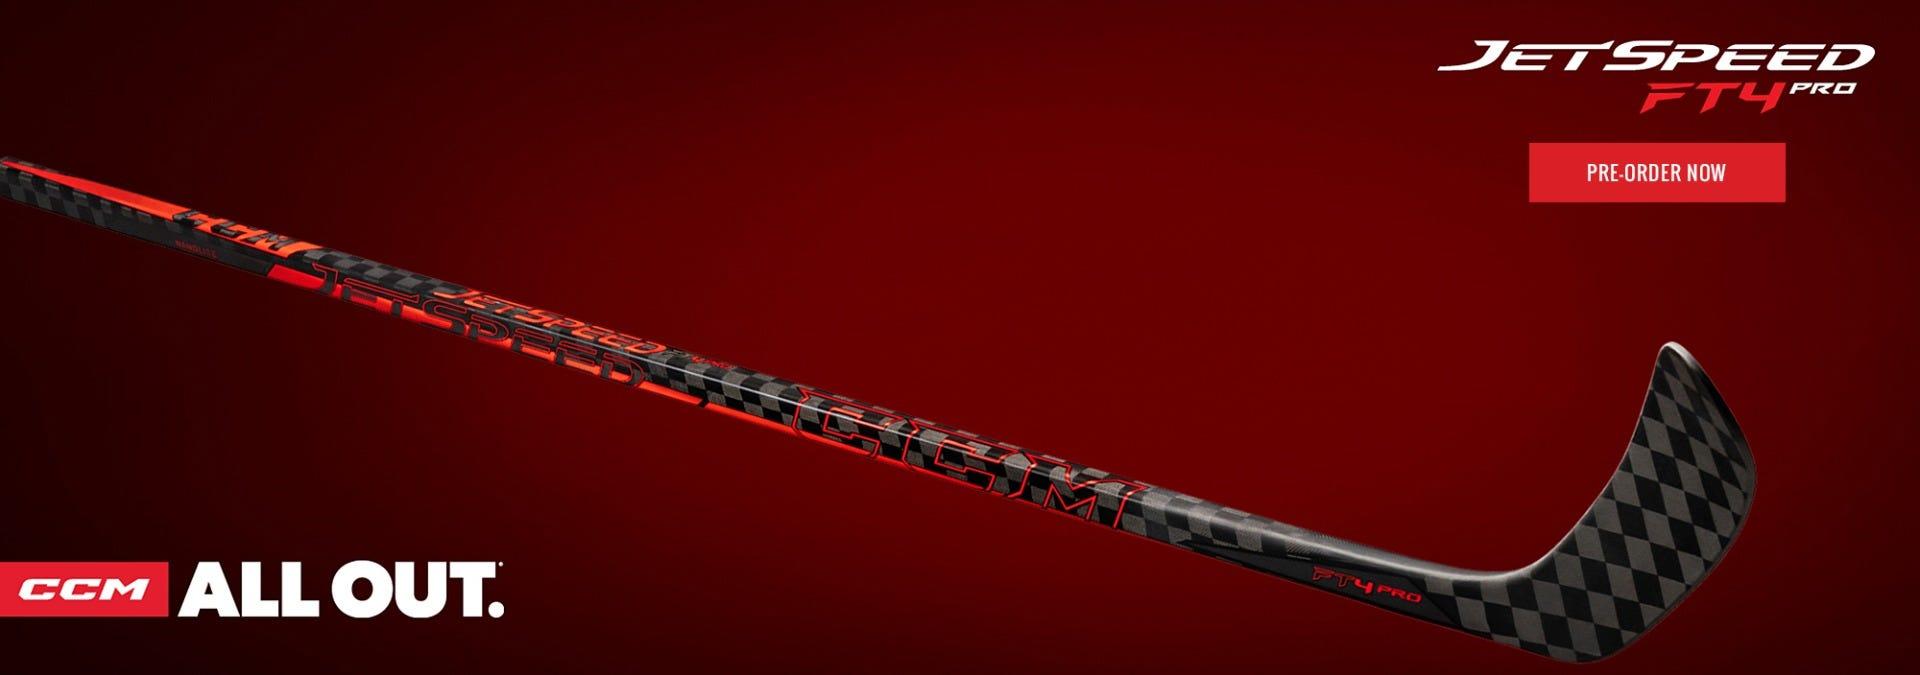 CCM JetSpeed FT4 Pro Hockey Sticks